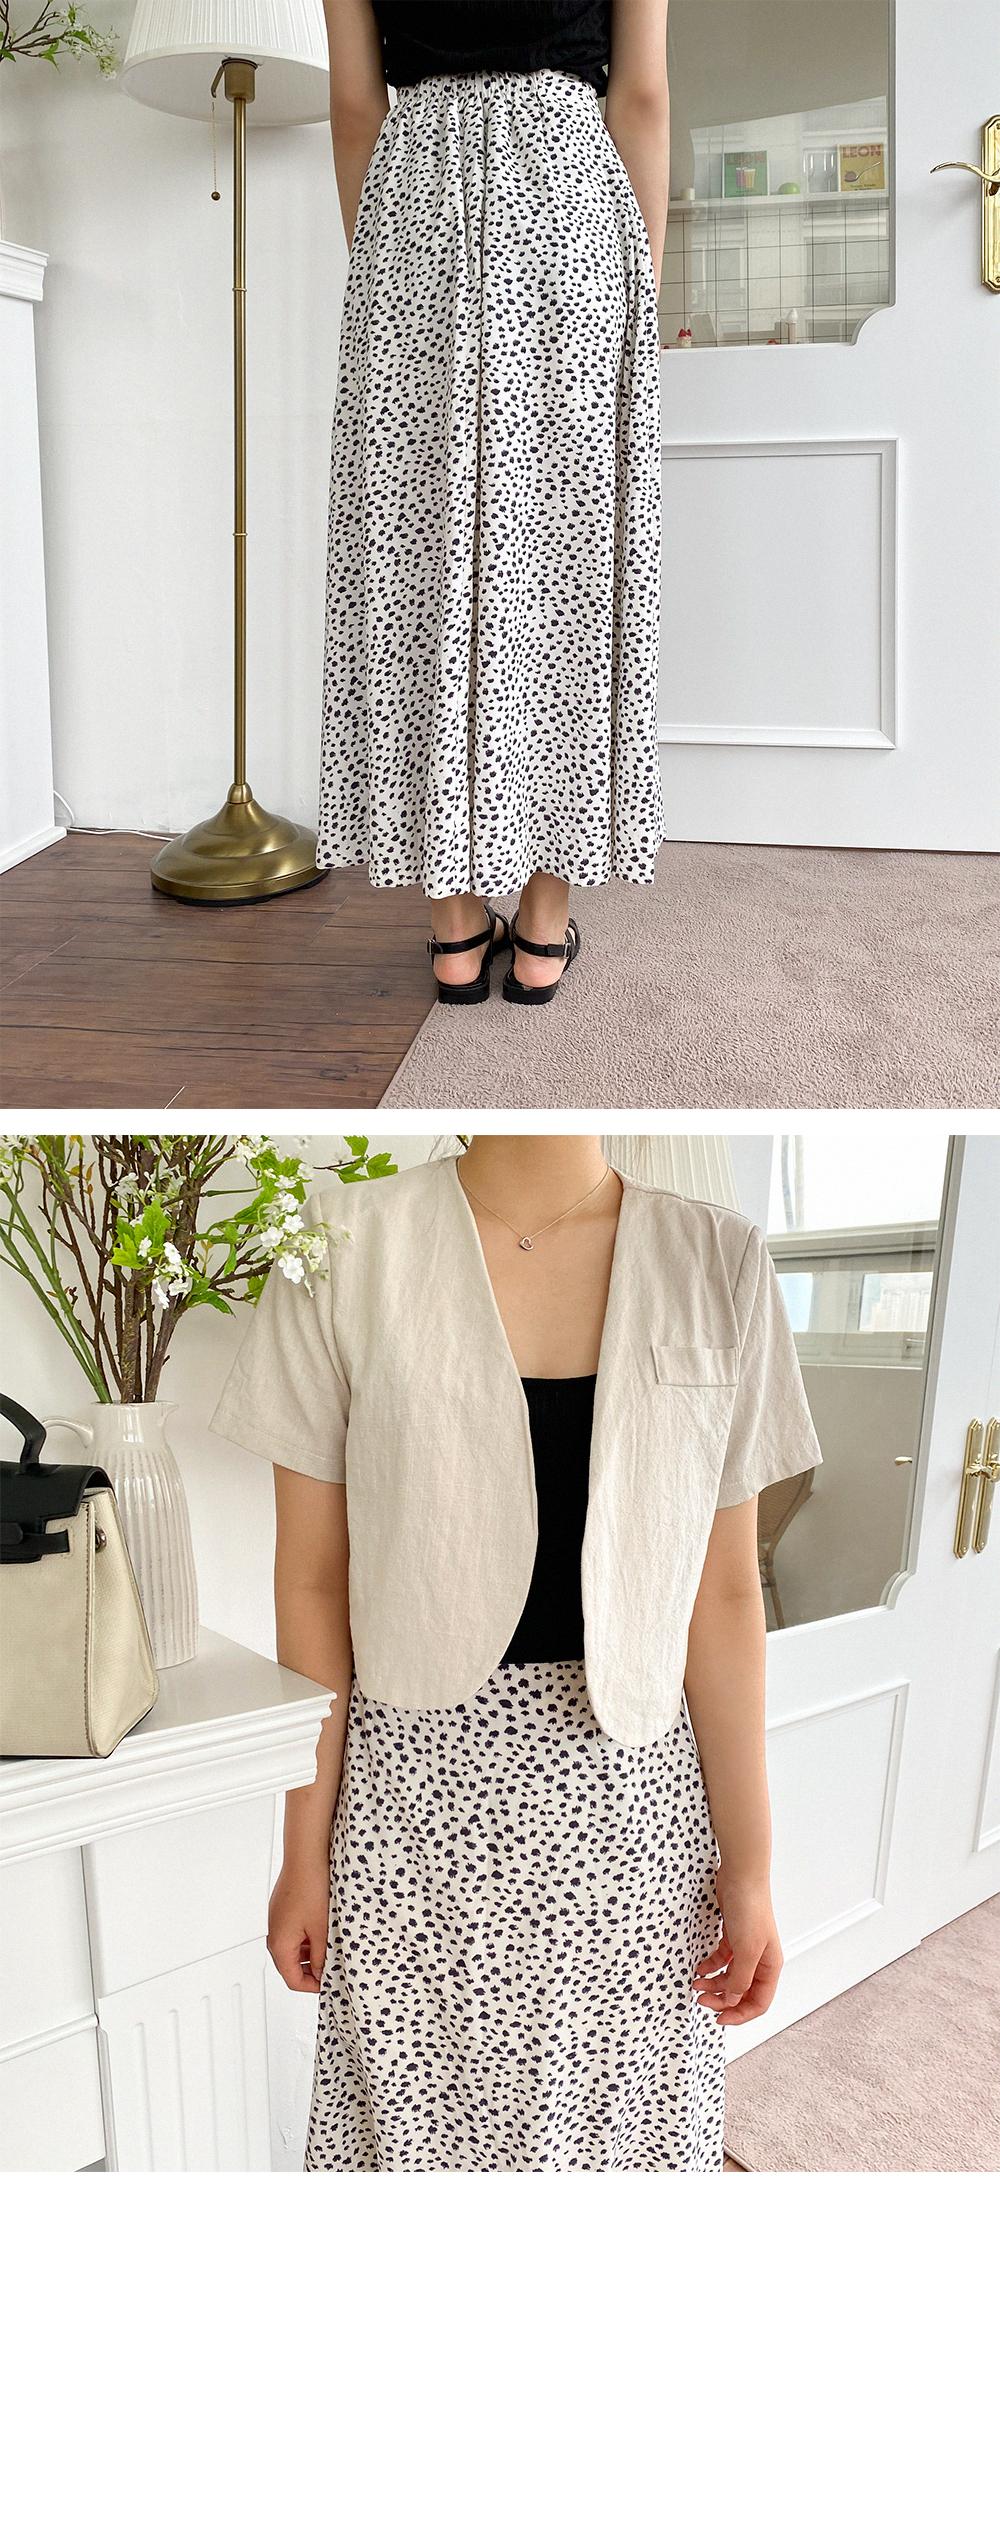 26-34 Inch Shilo Banding Maxi Skirt